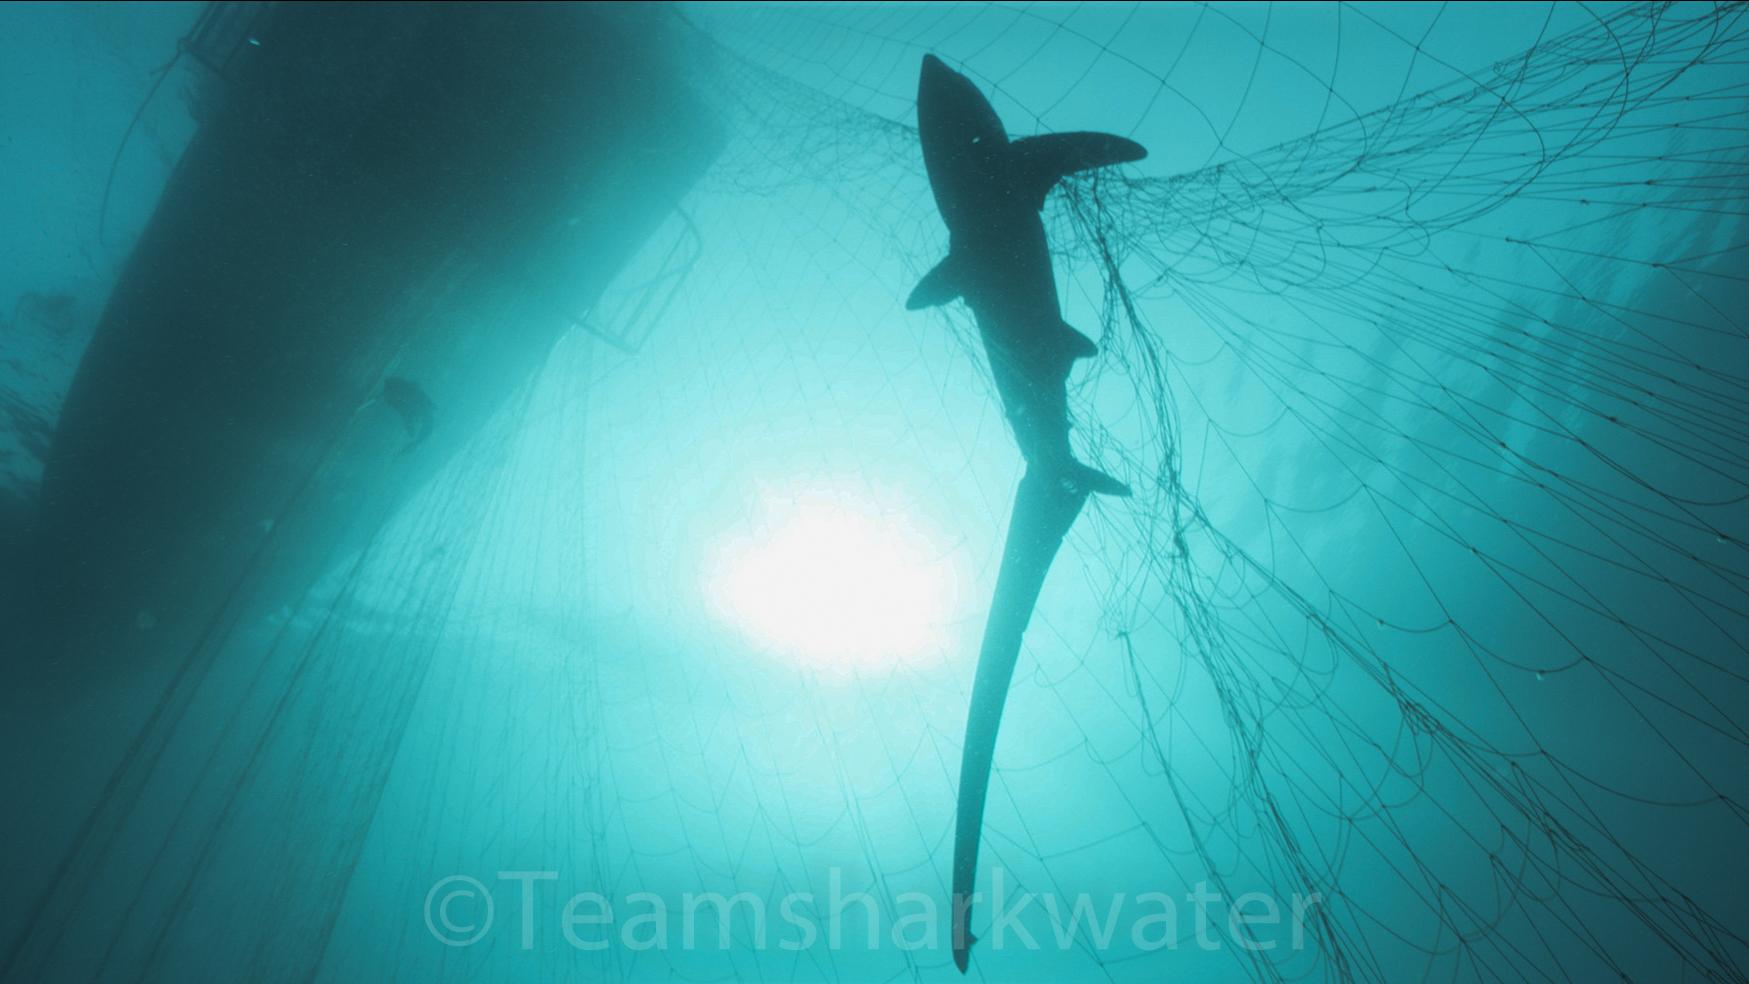 Assembly Passes Bill to Protect Marine Wildlife from California Driftnets